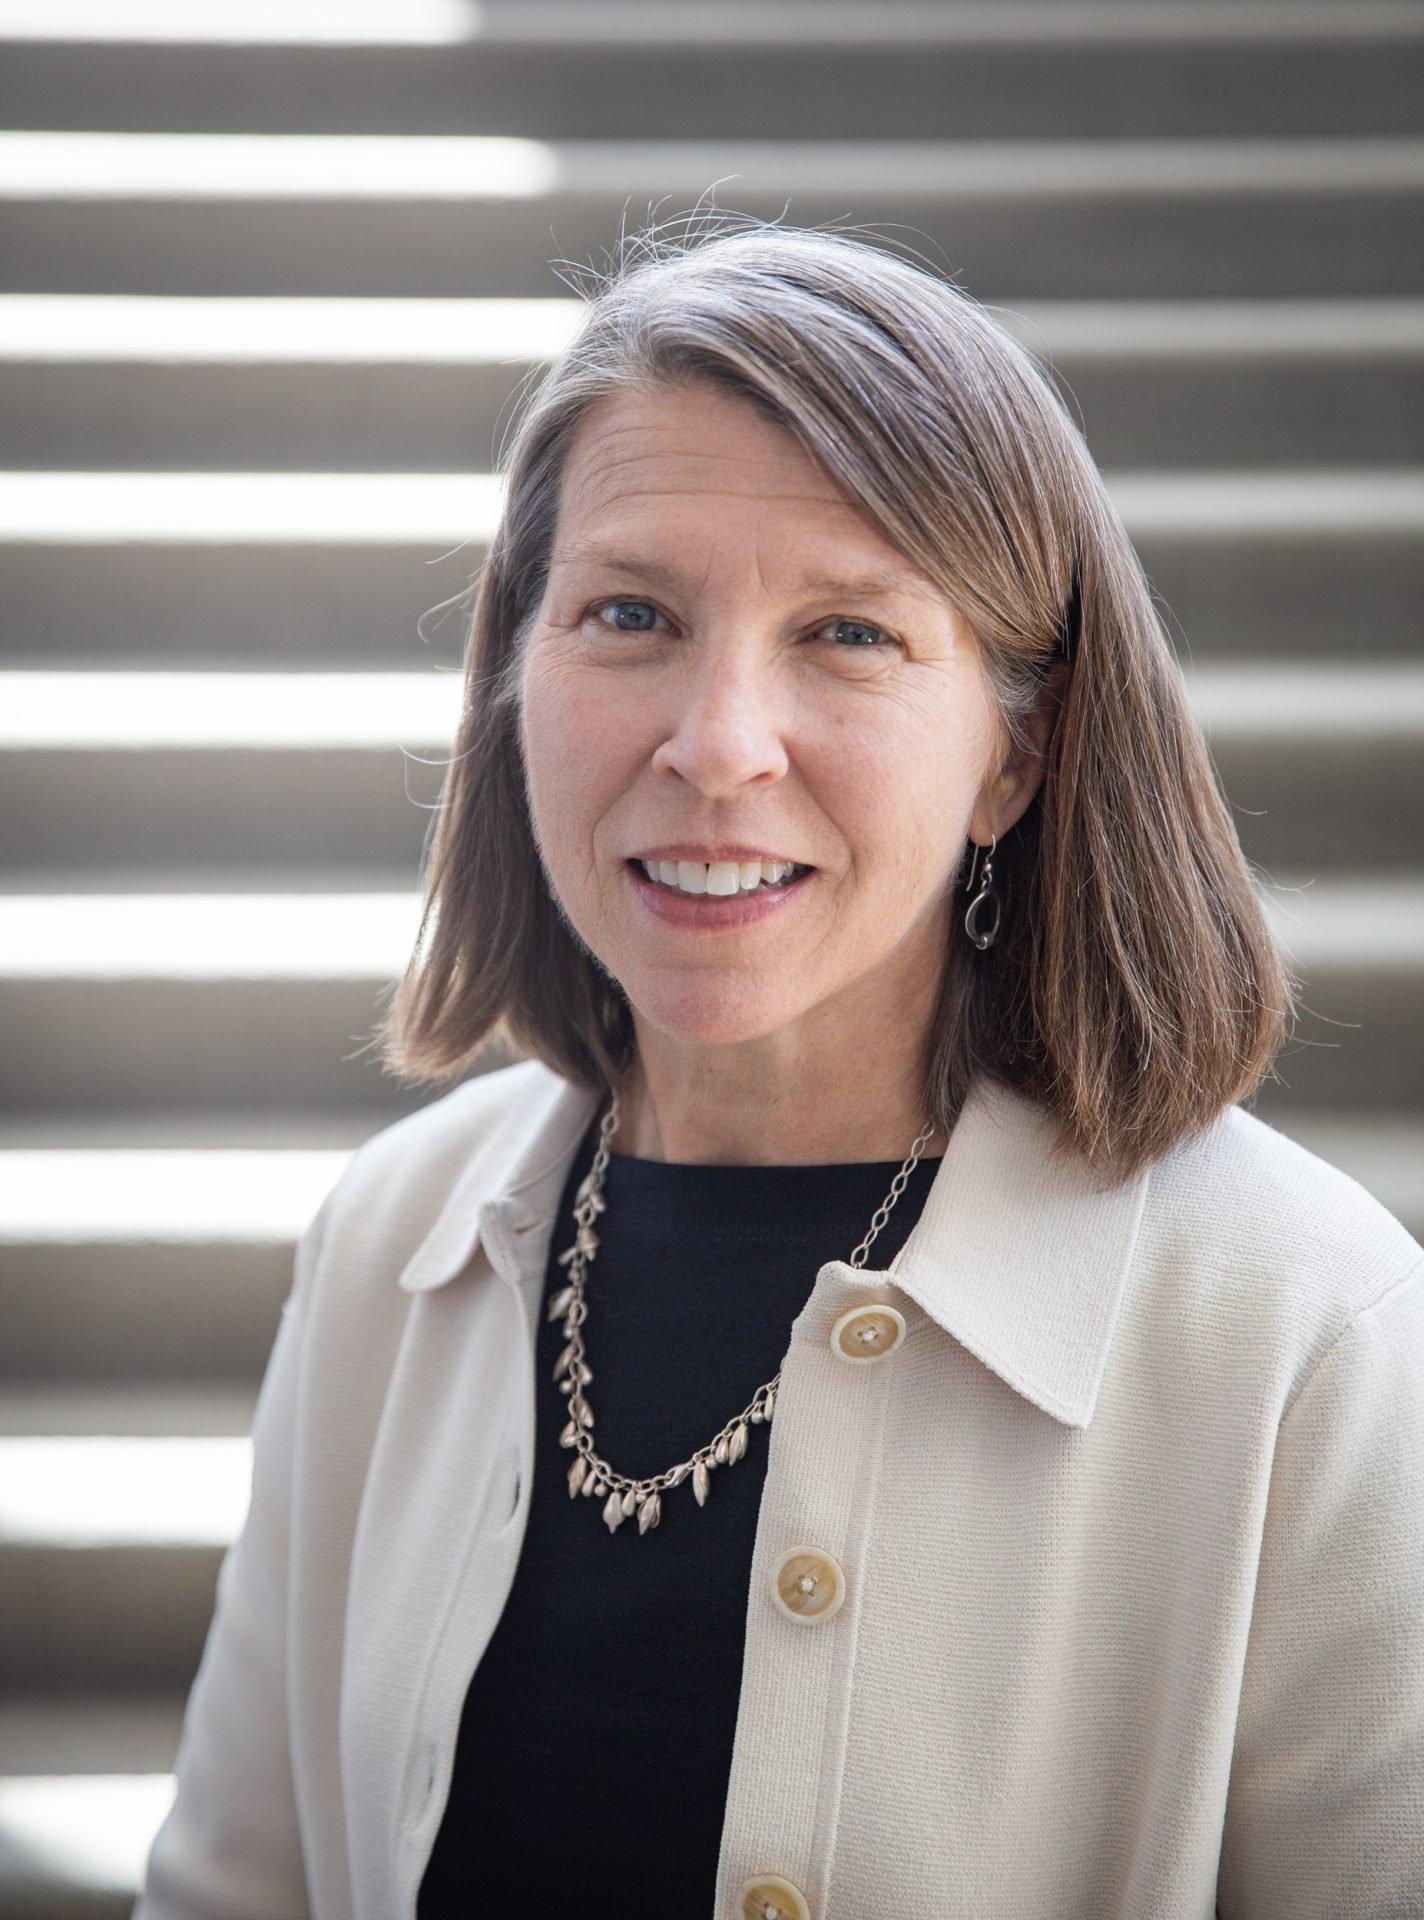 Kathleen Fairfield, MD, MPH, DrPH